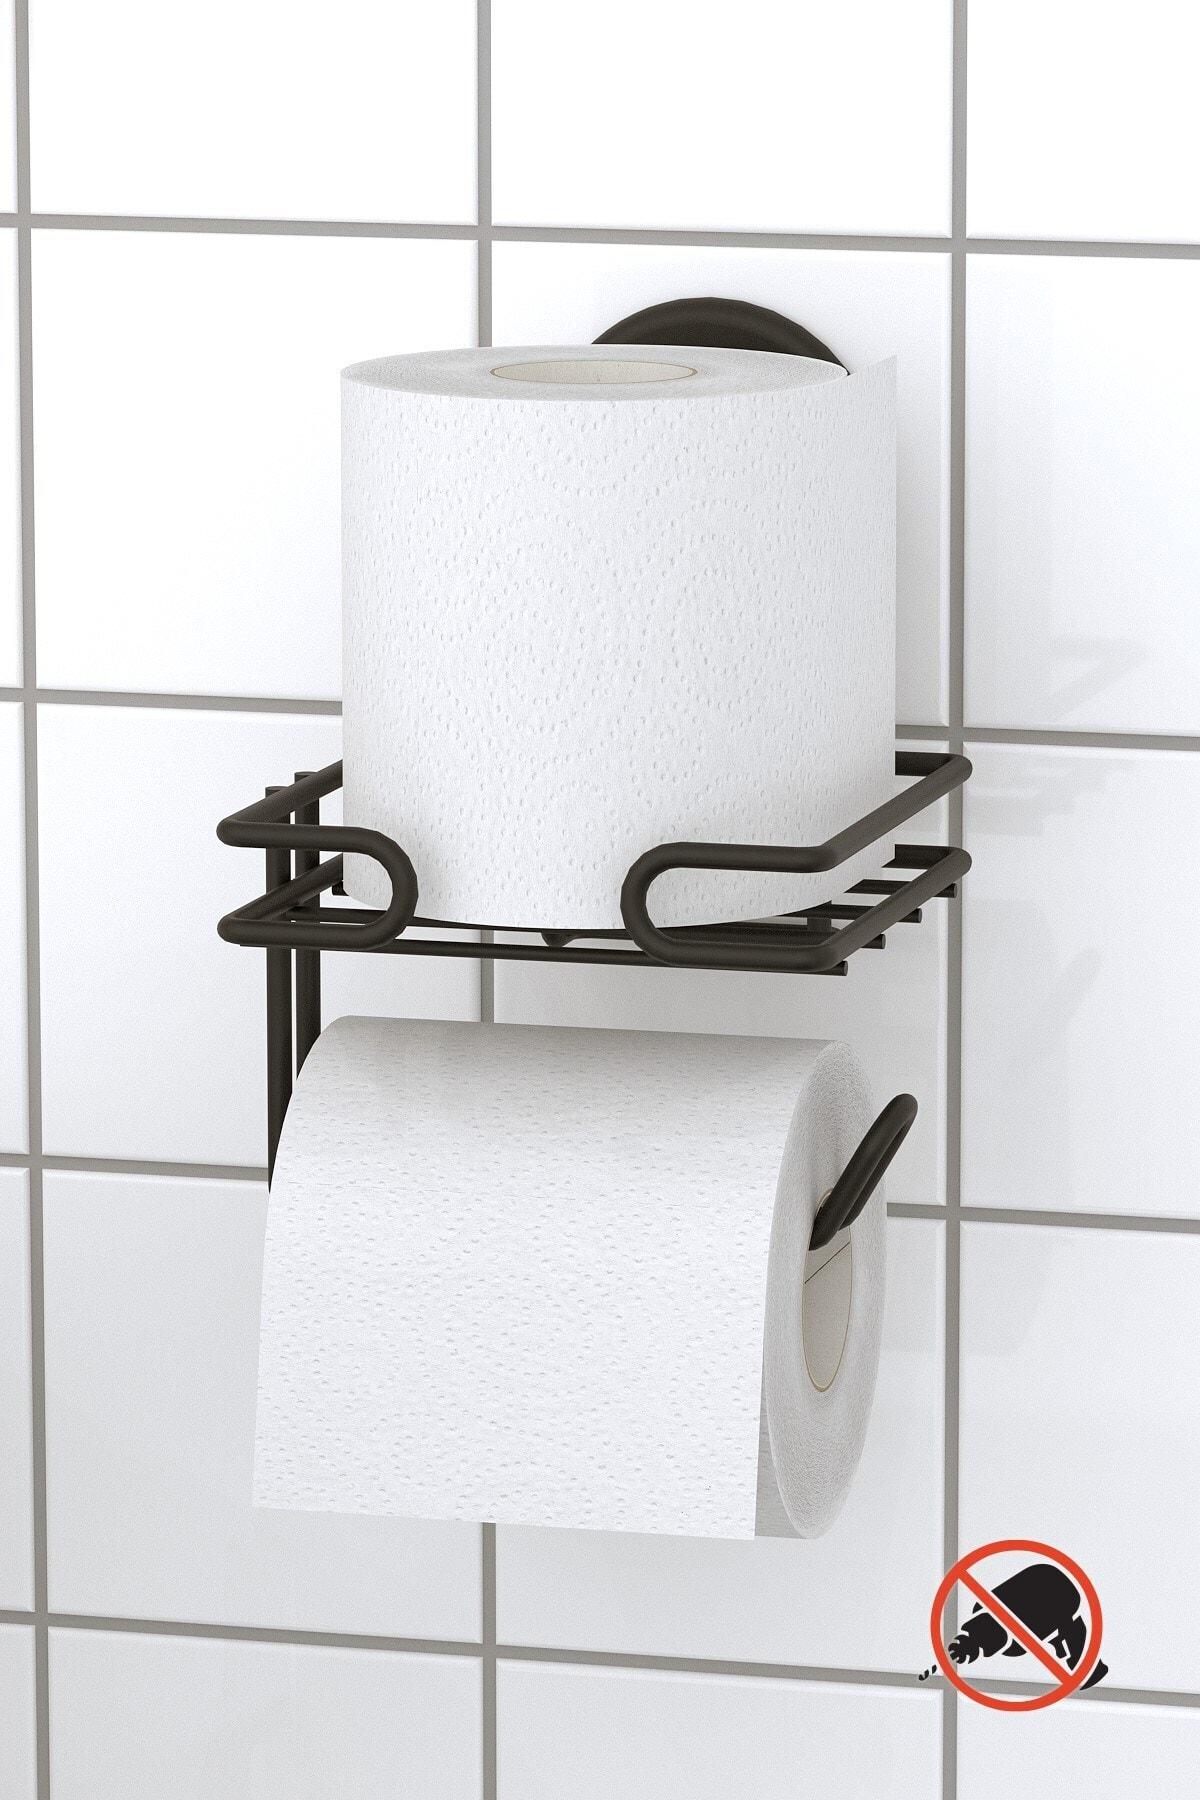 Teknotel Mat Siyah Vakumlu Yedekli Tuvalet Kağıtlık Dm275 2